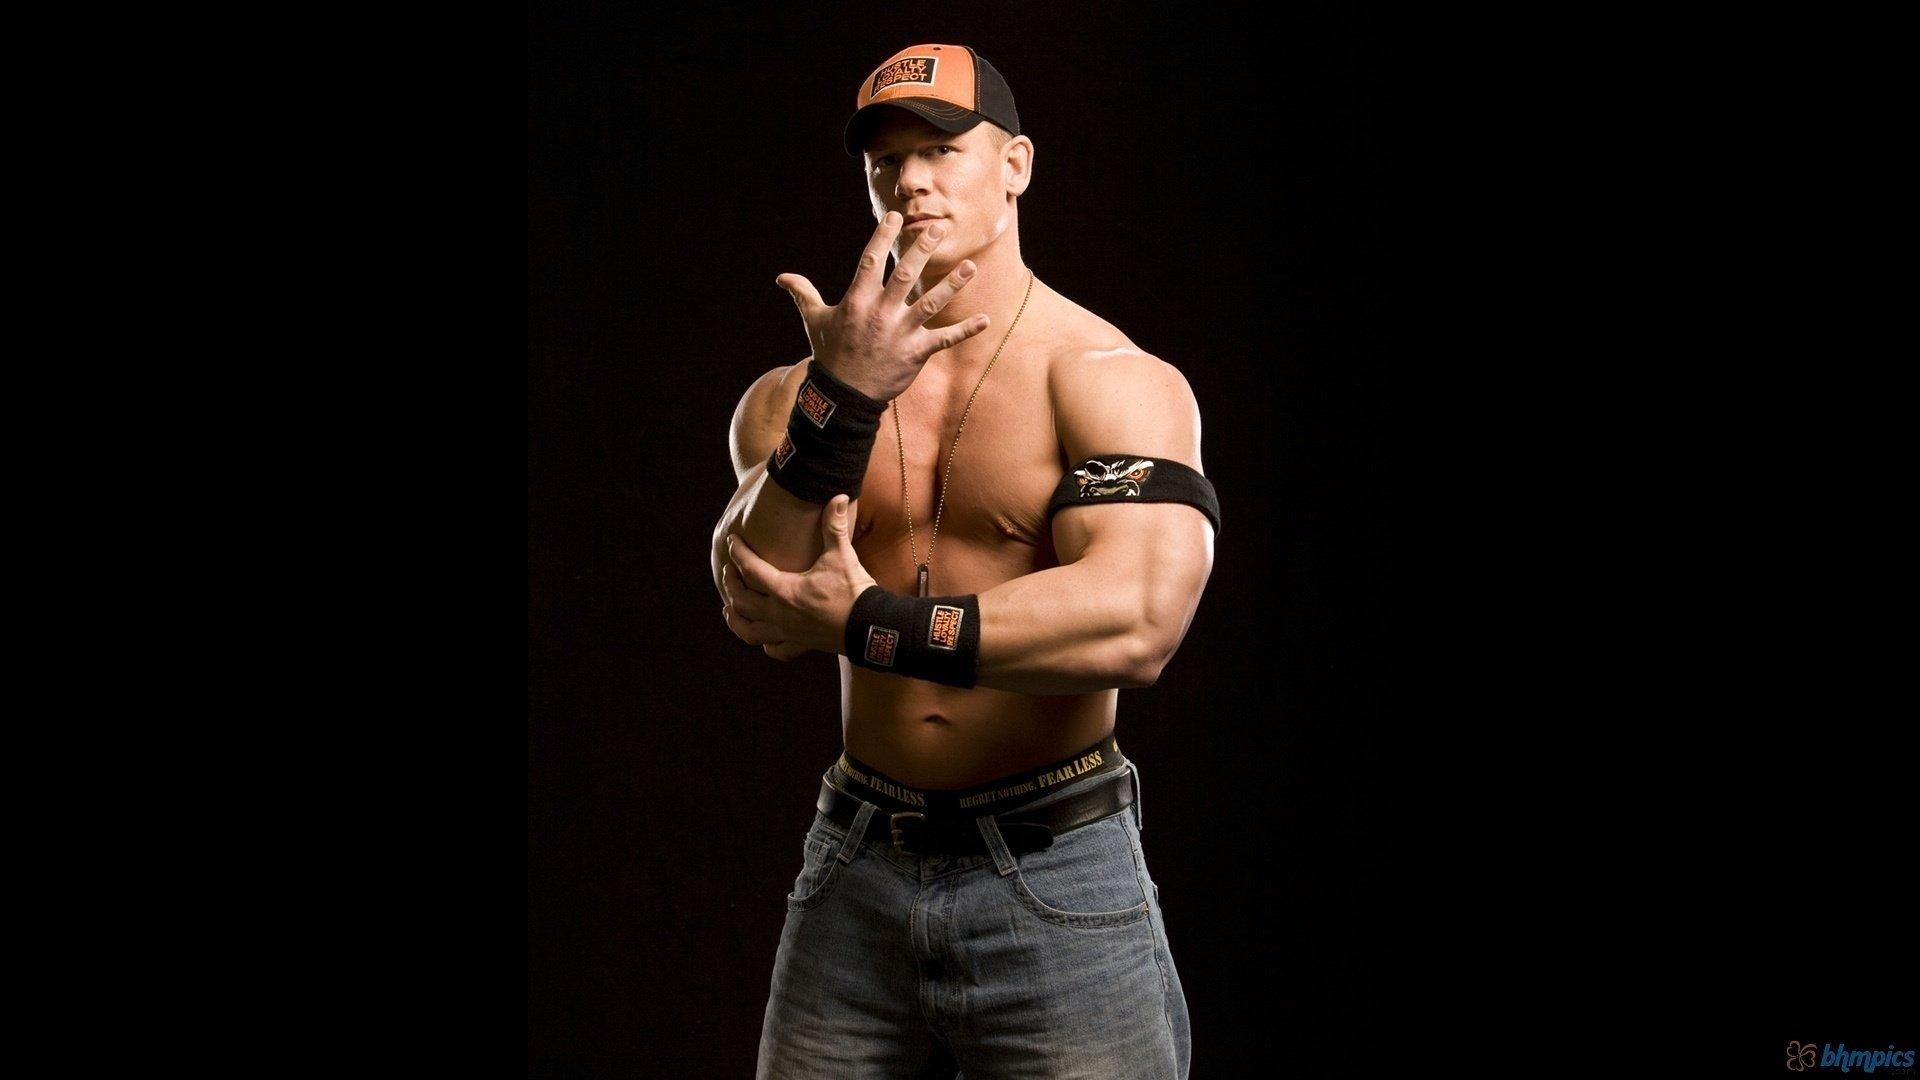 WWE HD wallpaper for download in laptop and desktop